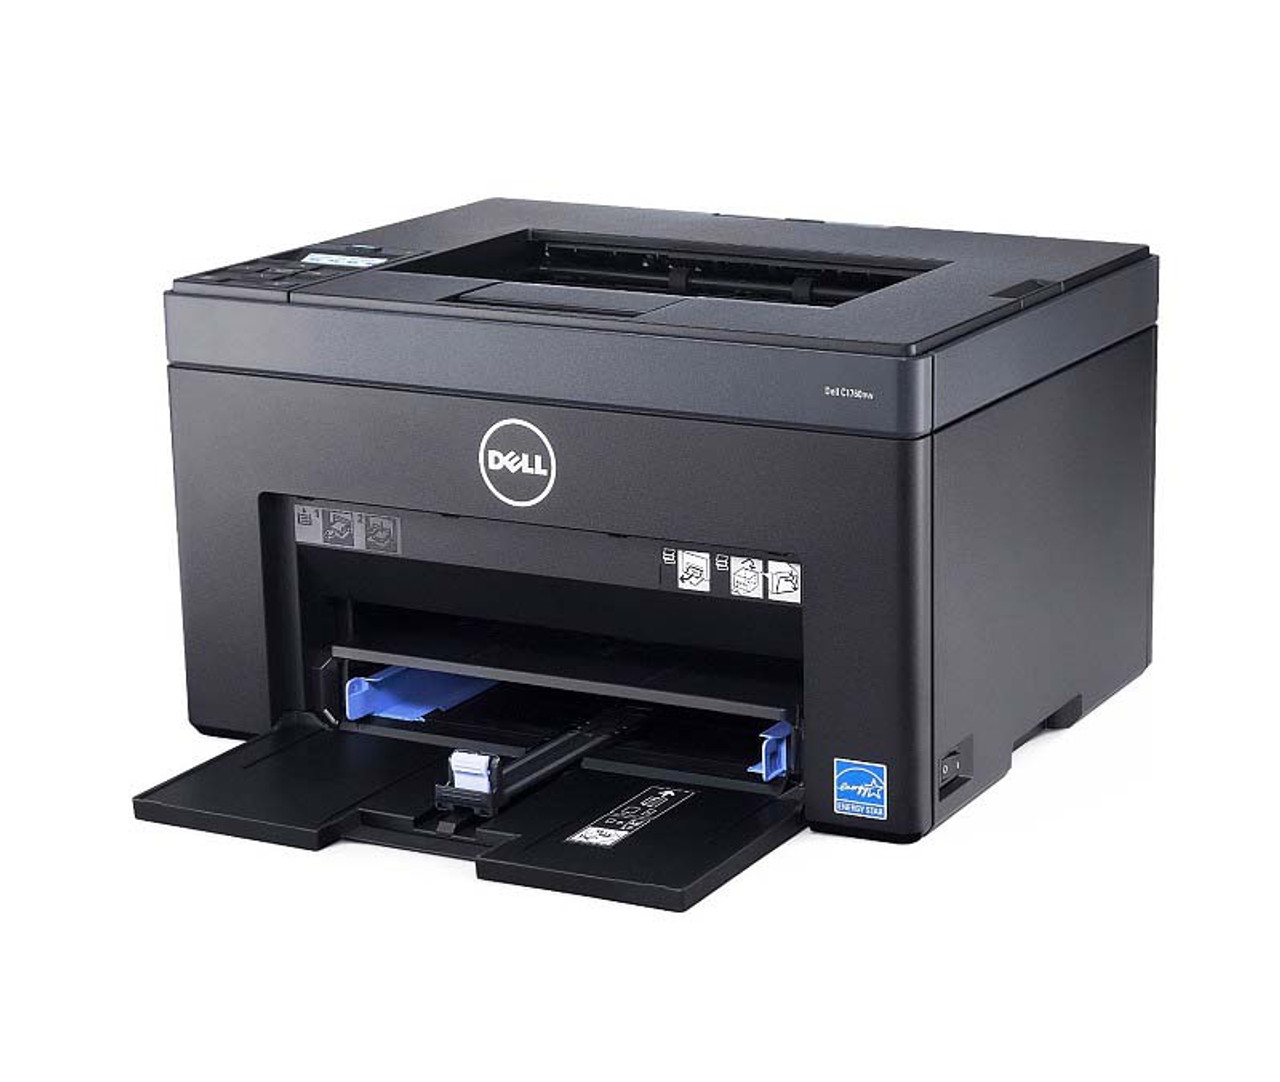 225-4111 - Dell C1760nw Wireless Color Laser Printer